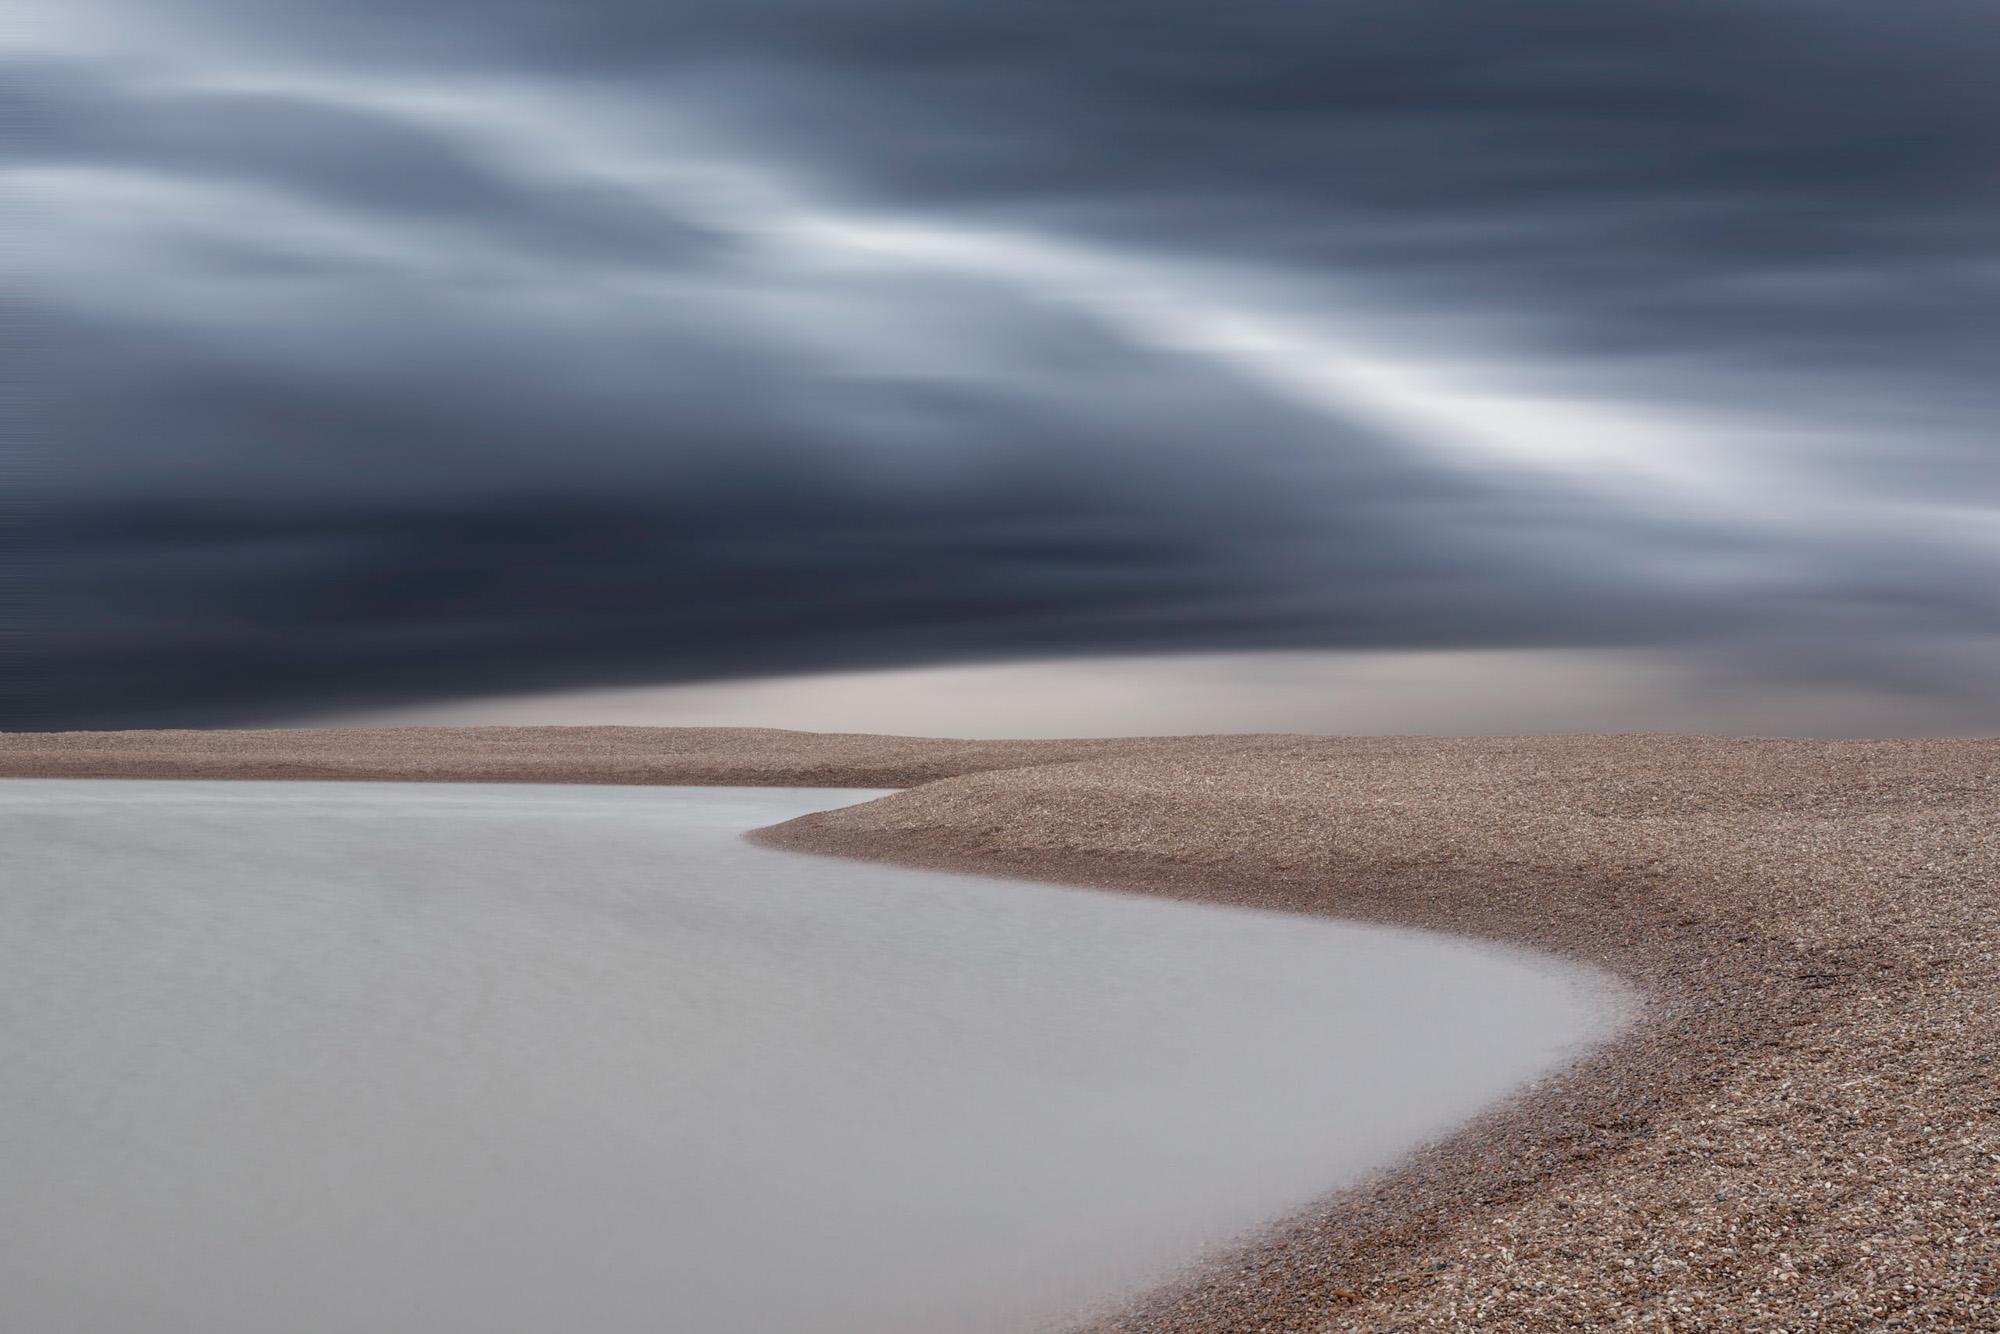 minimal long exposure photograph of a storm over a shingle beach